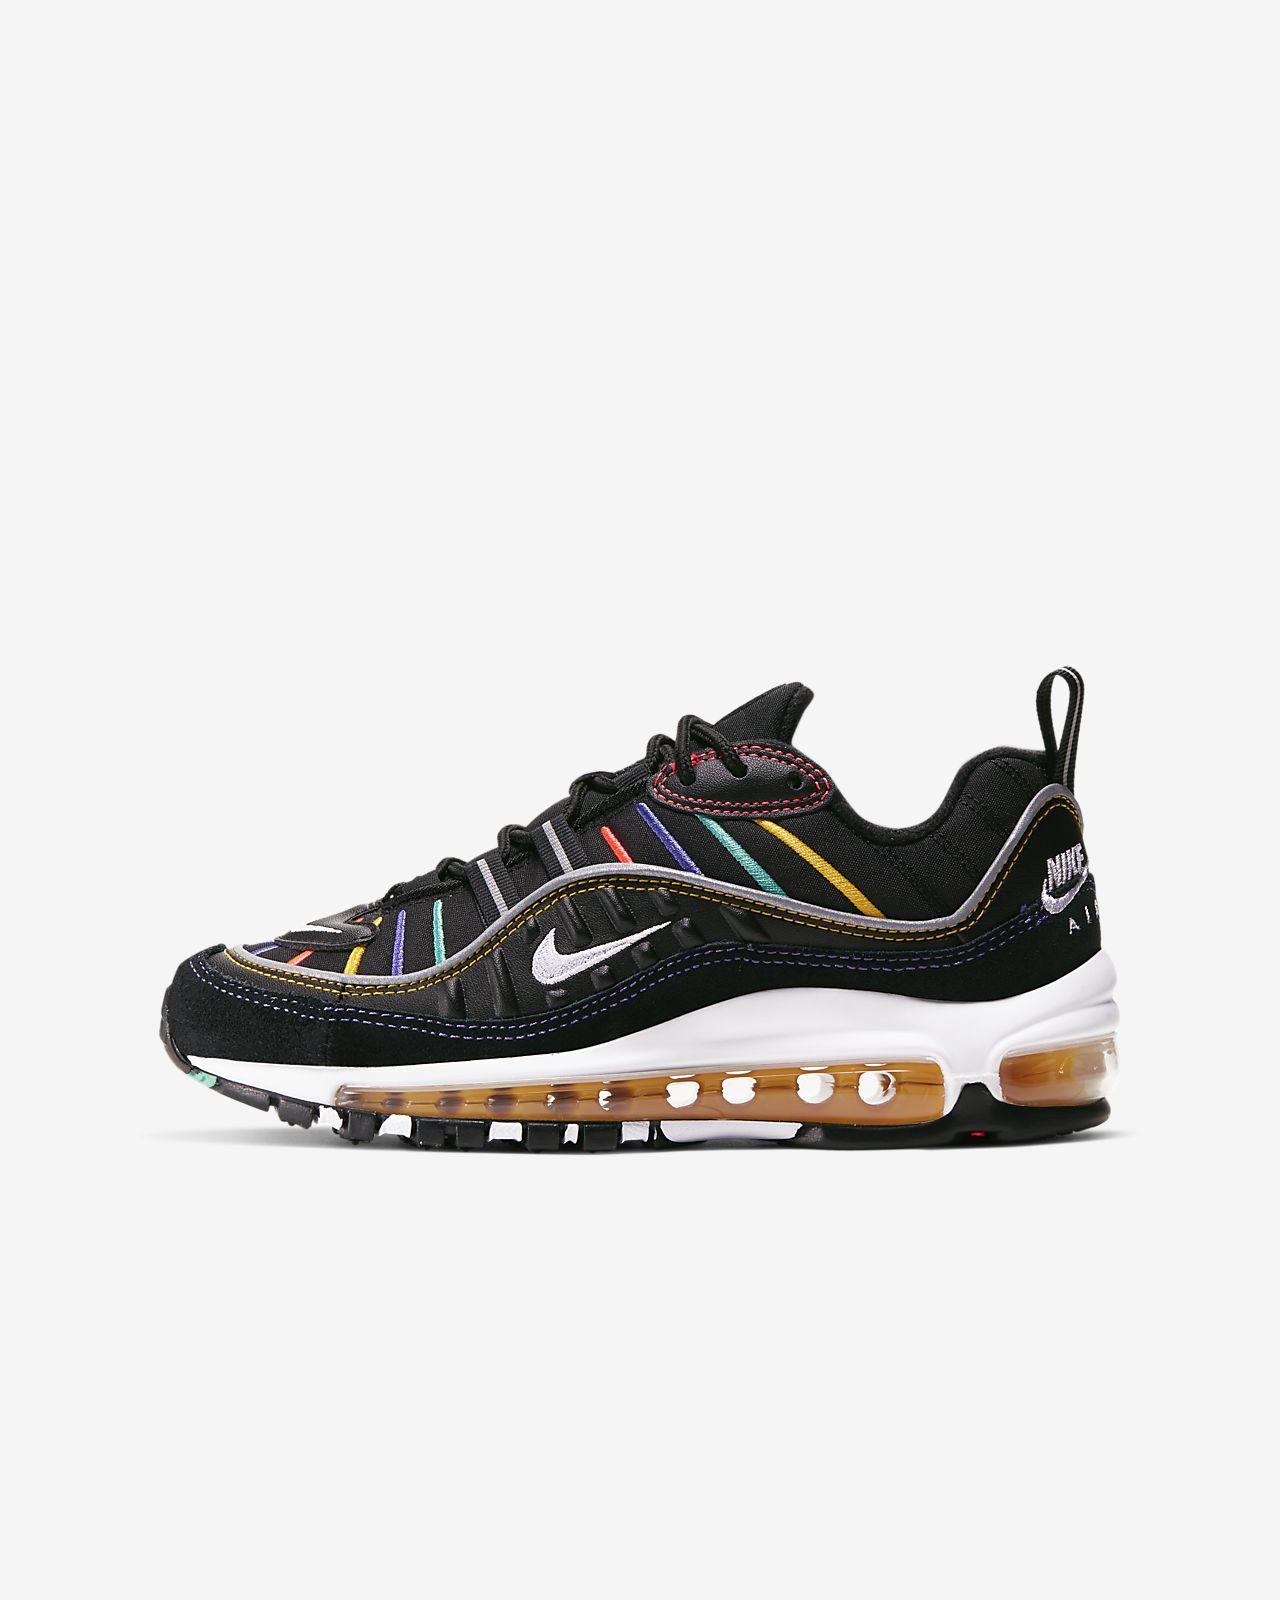 Nike Air Max 98 Game Change Big Kids' Shoe